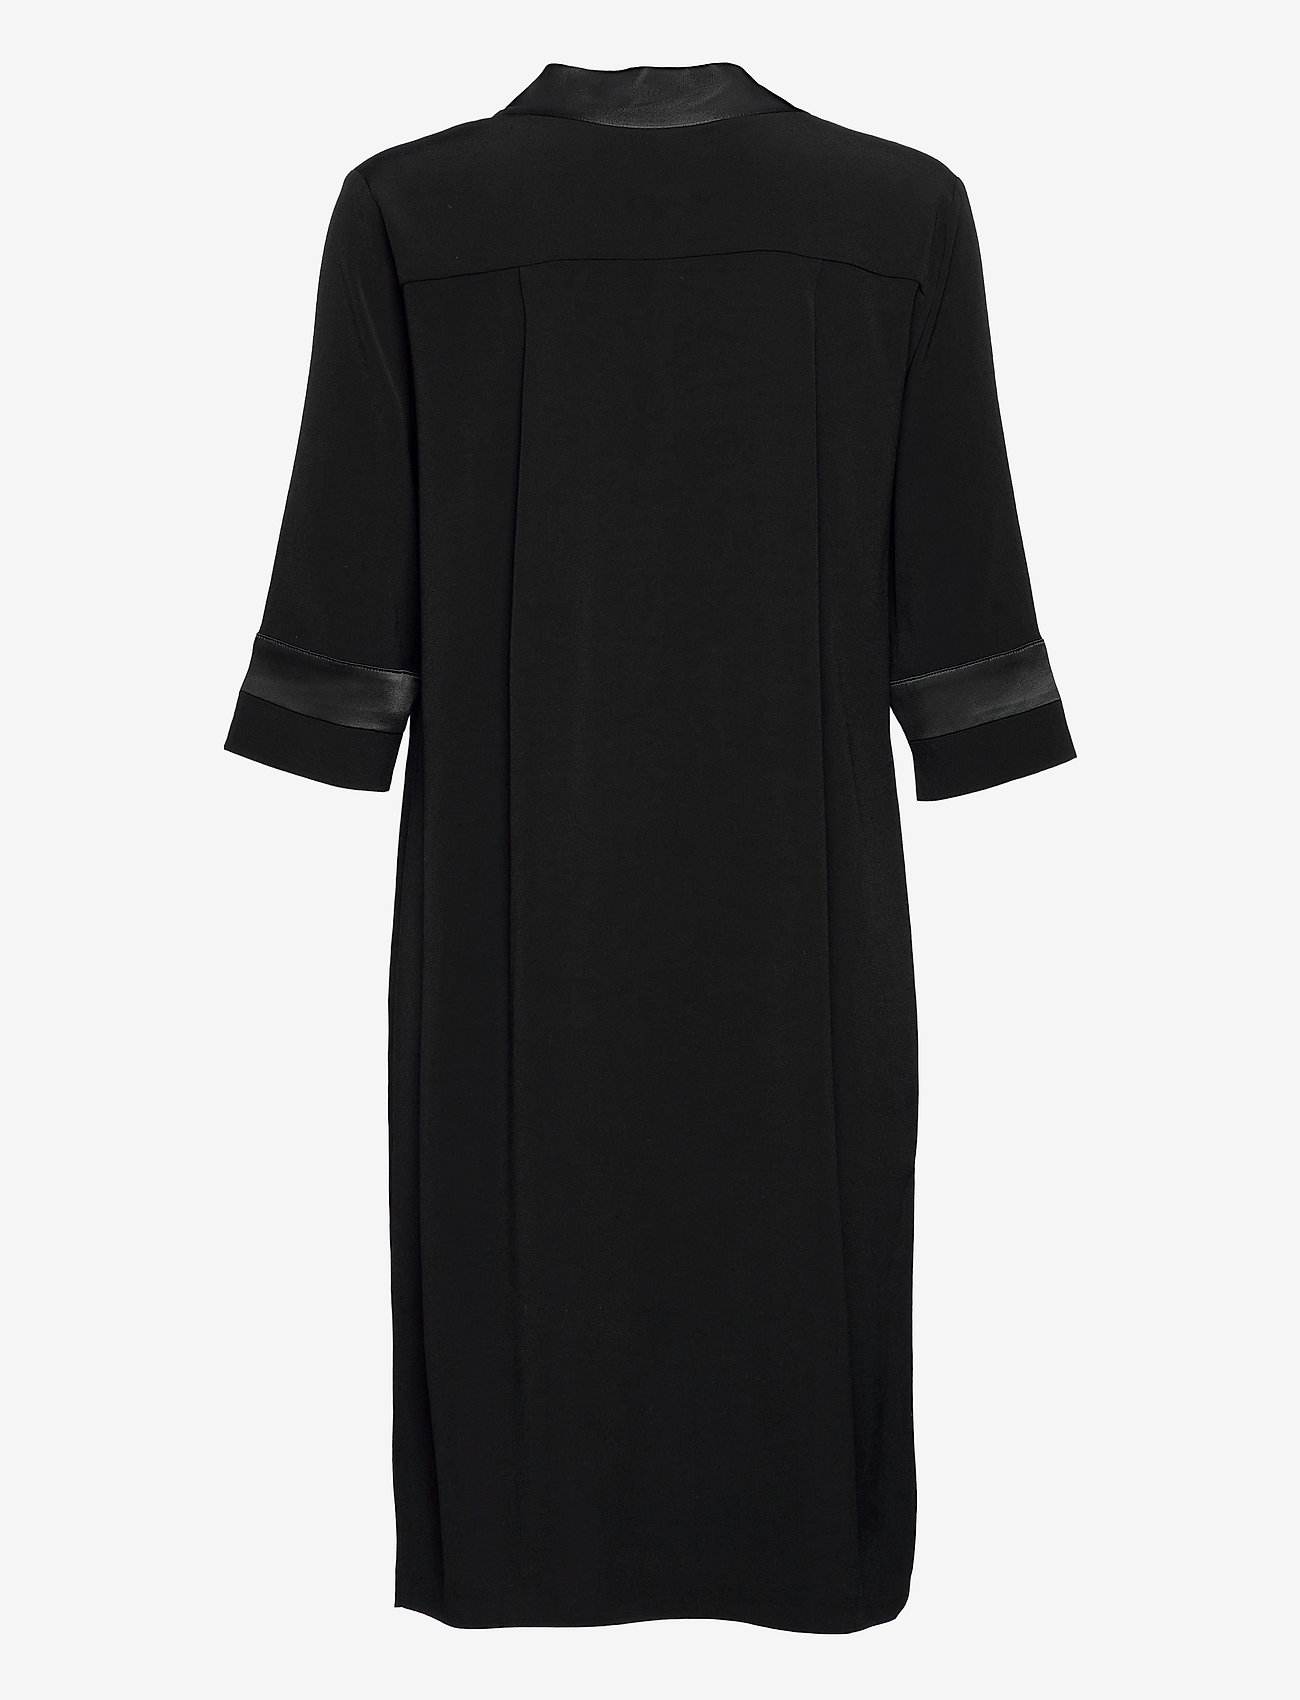 SAND - Crepe Satin Back - Ambar - robes de jour - black - 1